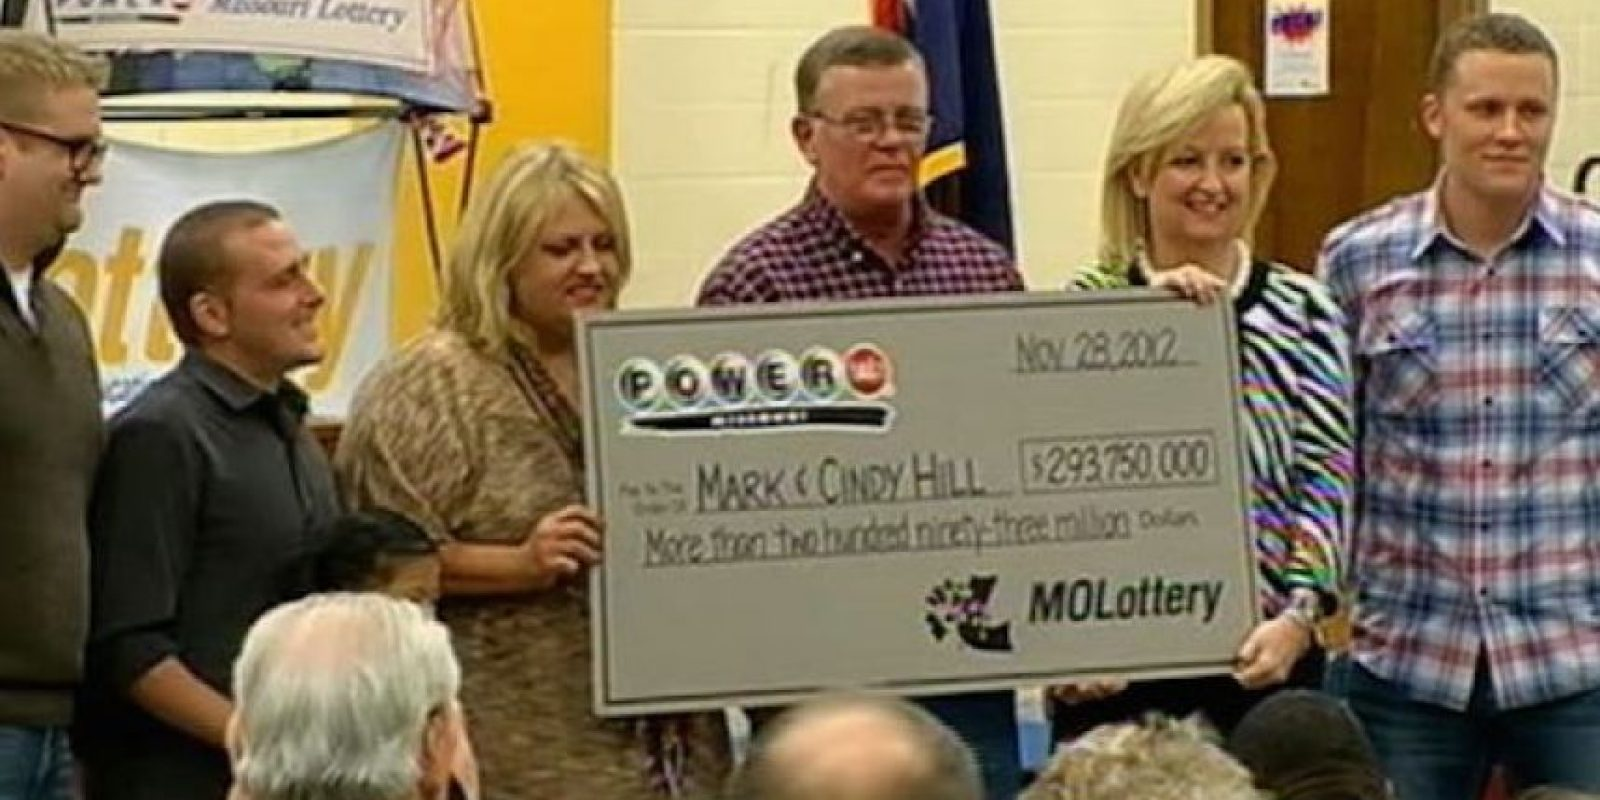 Mark Hamill ganó más de 200 millones de dólares Foto:ABC News